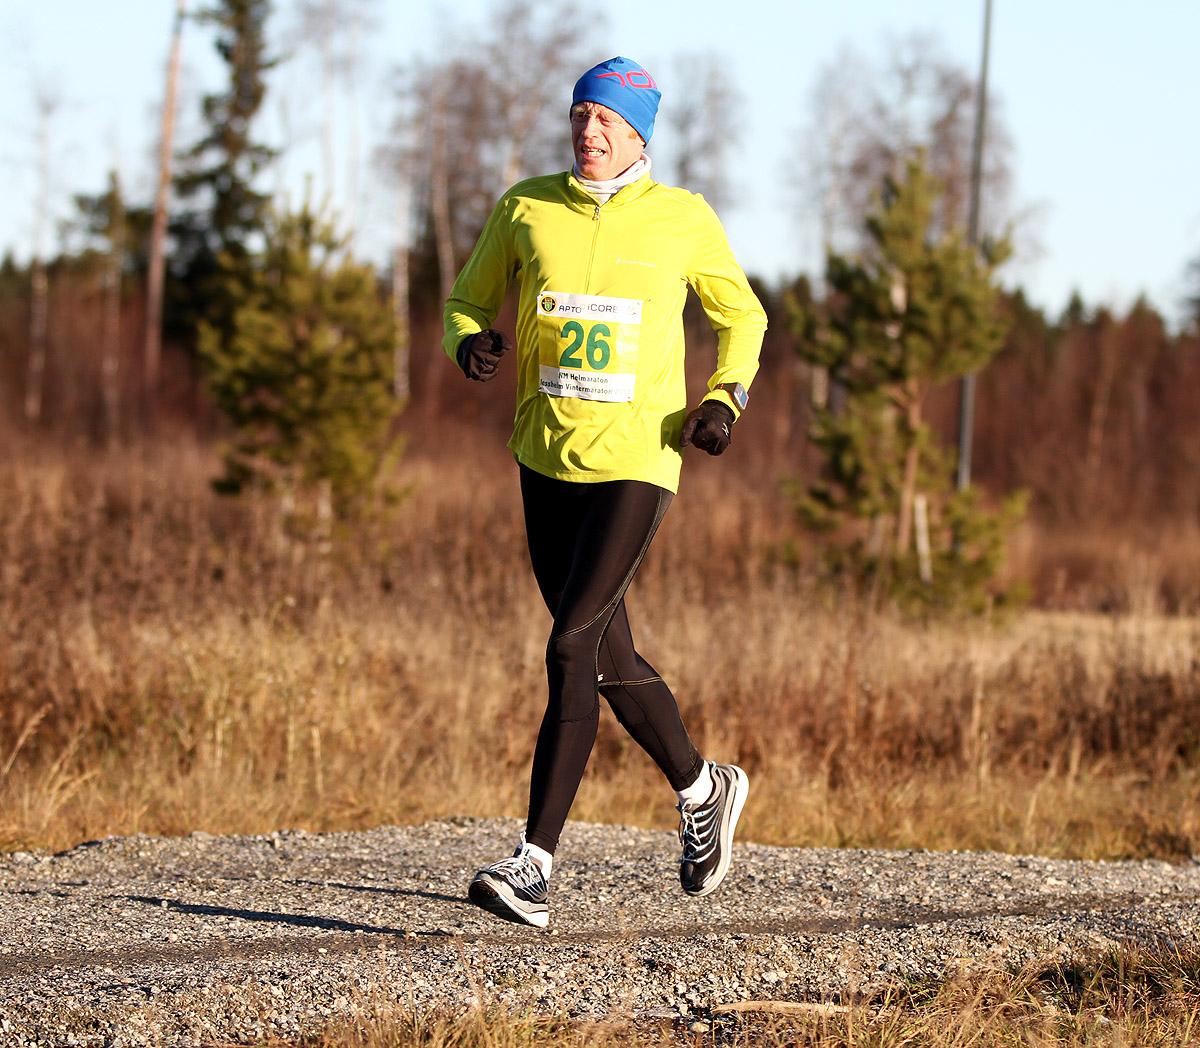 Vintermaraton2013_Tor-Idar-Lillekroken_31-3km.jpg